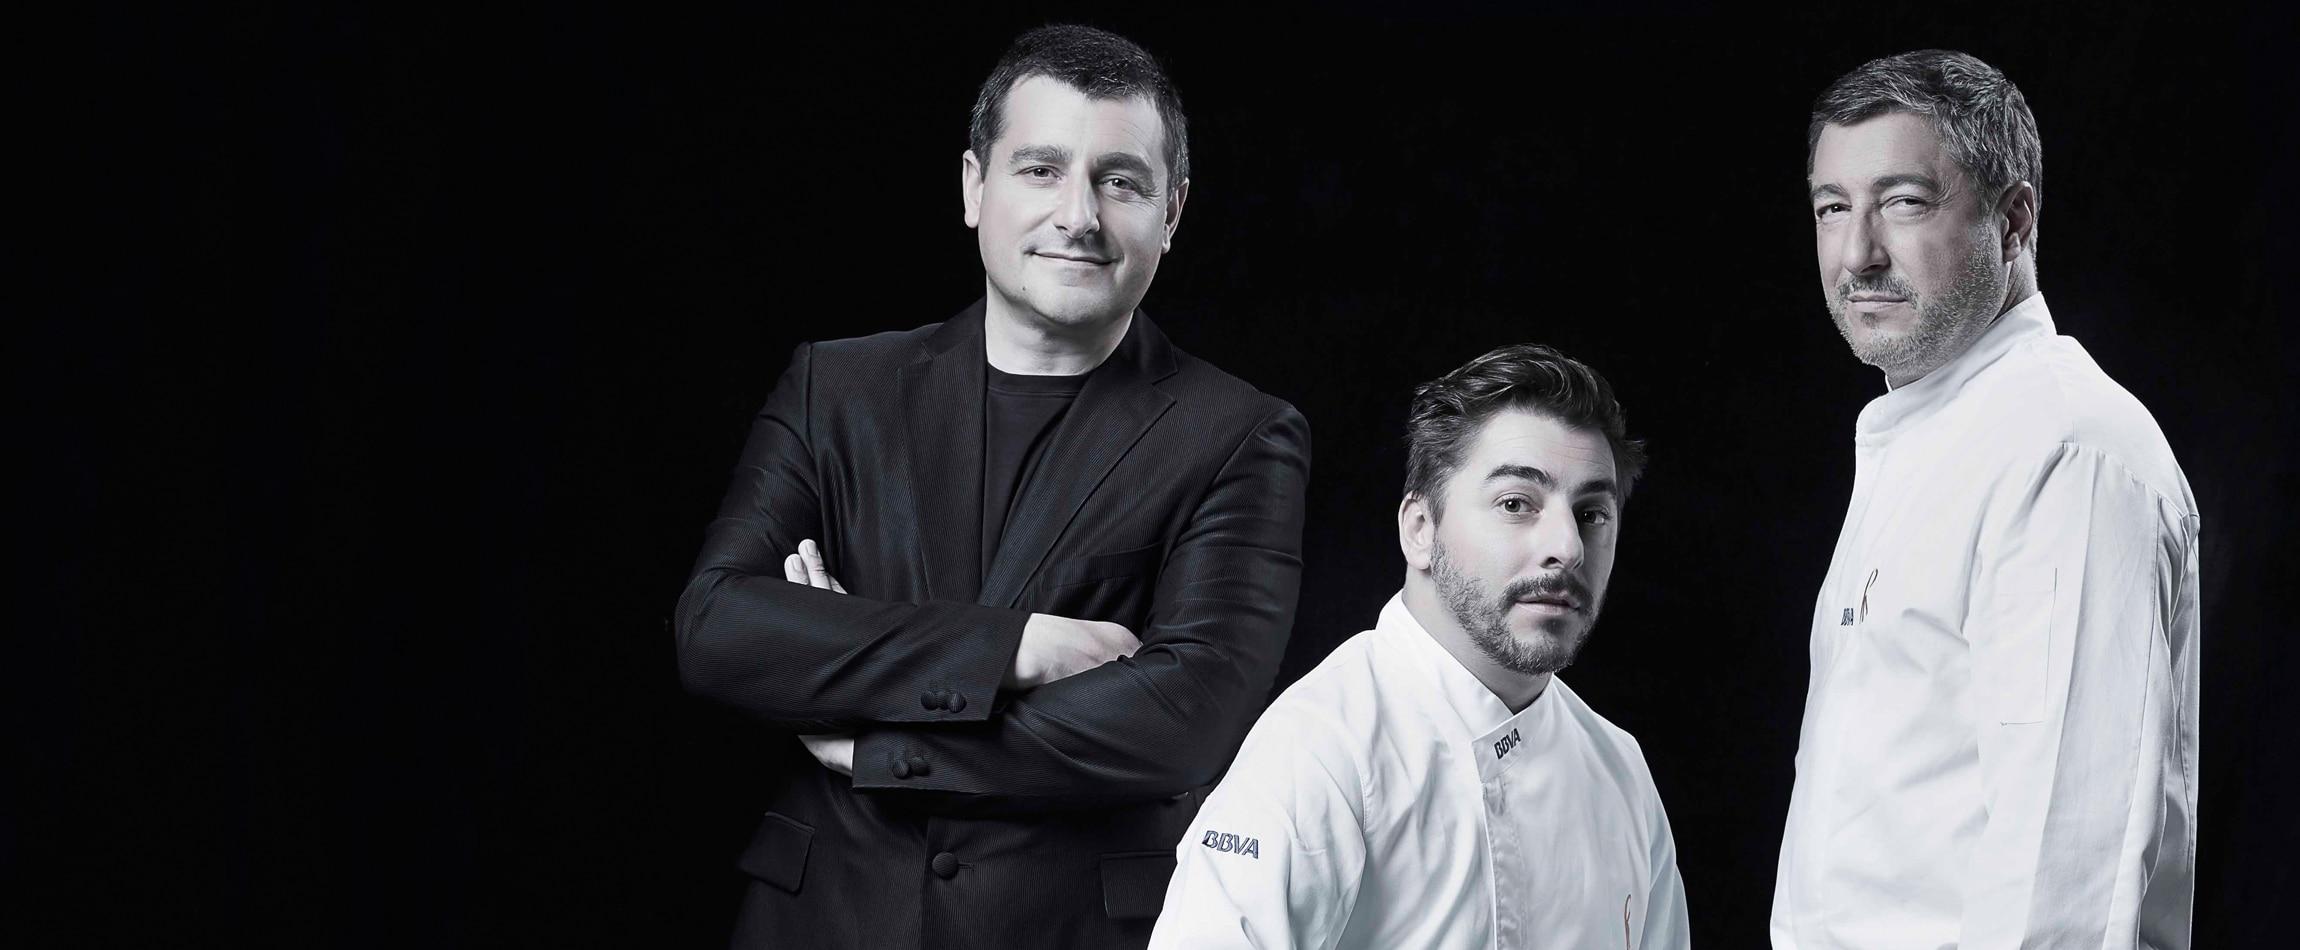 Josep, Jordi y Joan Roca por Gaby Herbstein